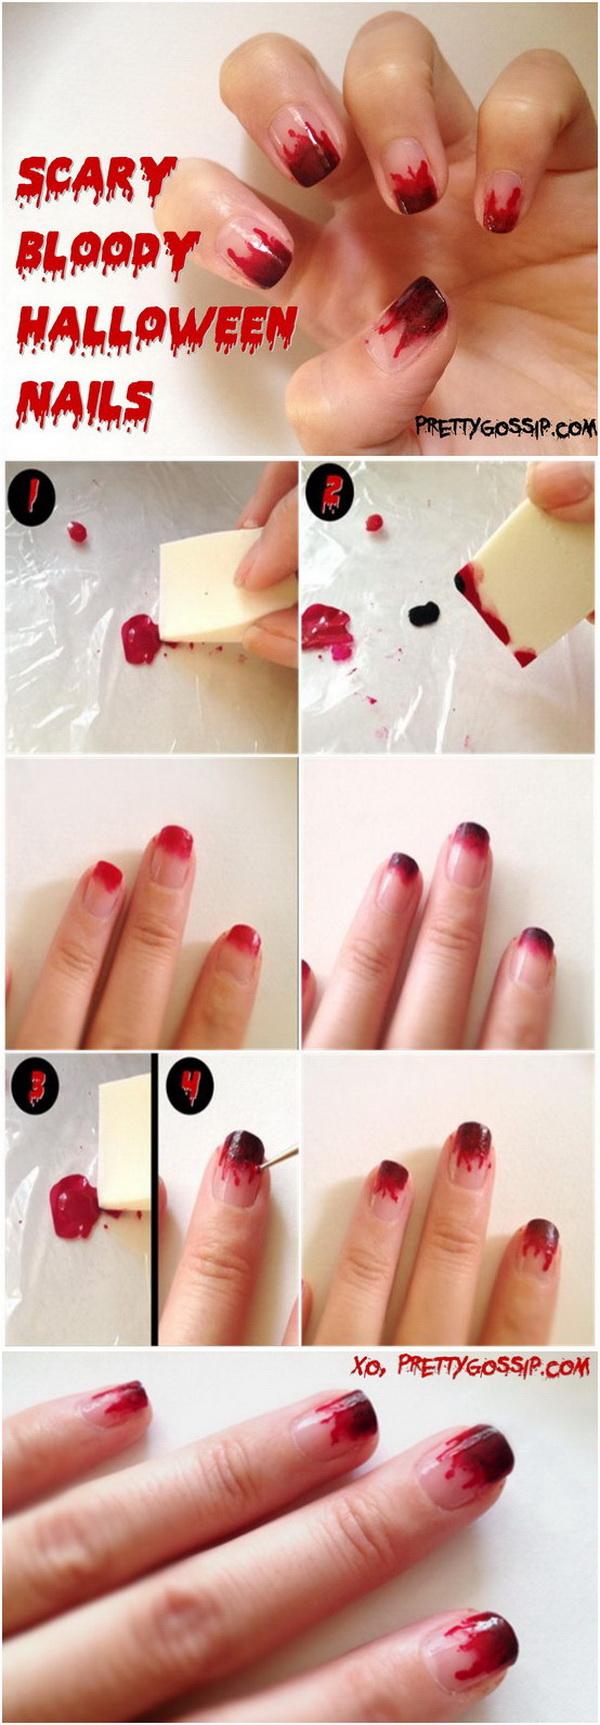 DIY Scary & Bloody Halloween Nail.